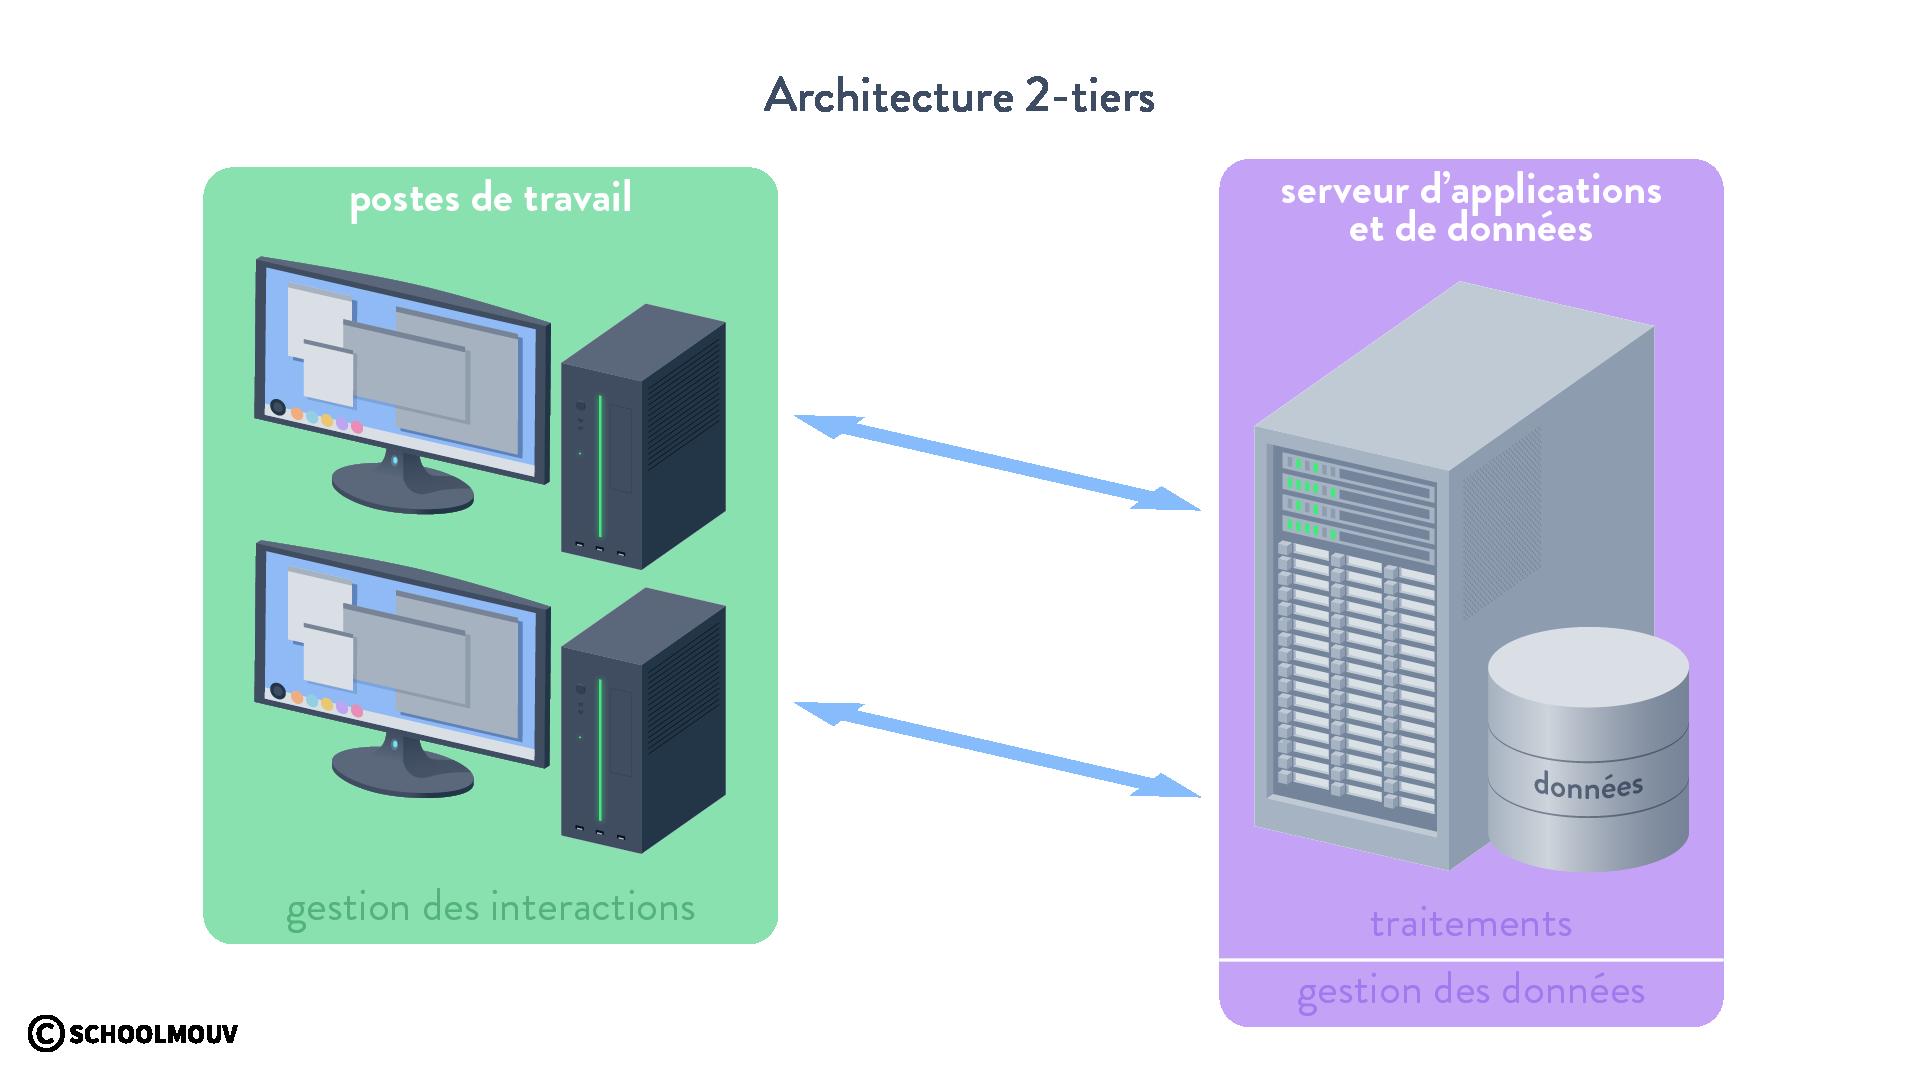 Architecture 2-tiers SGBD